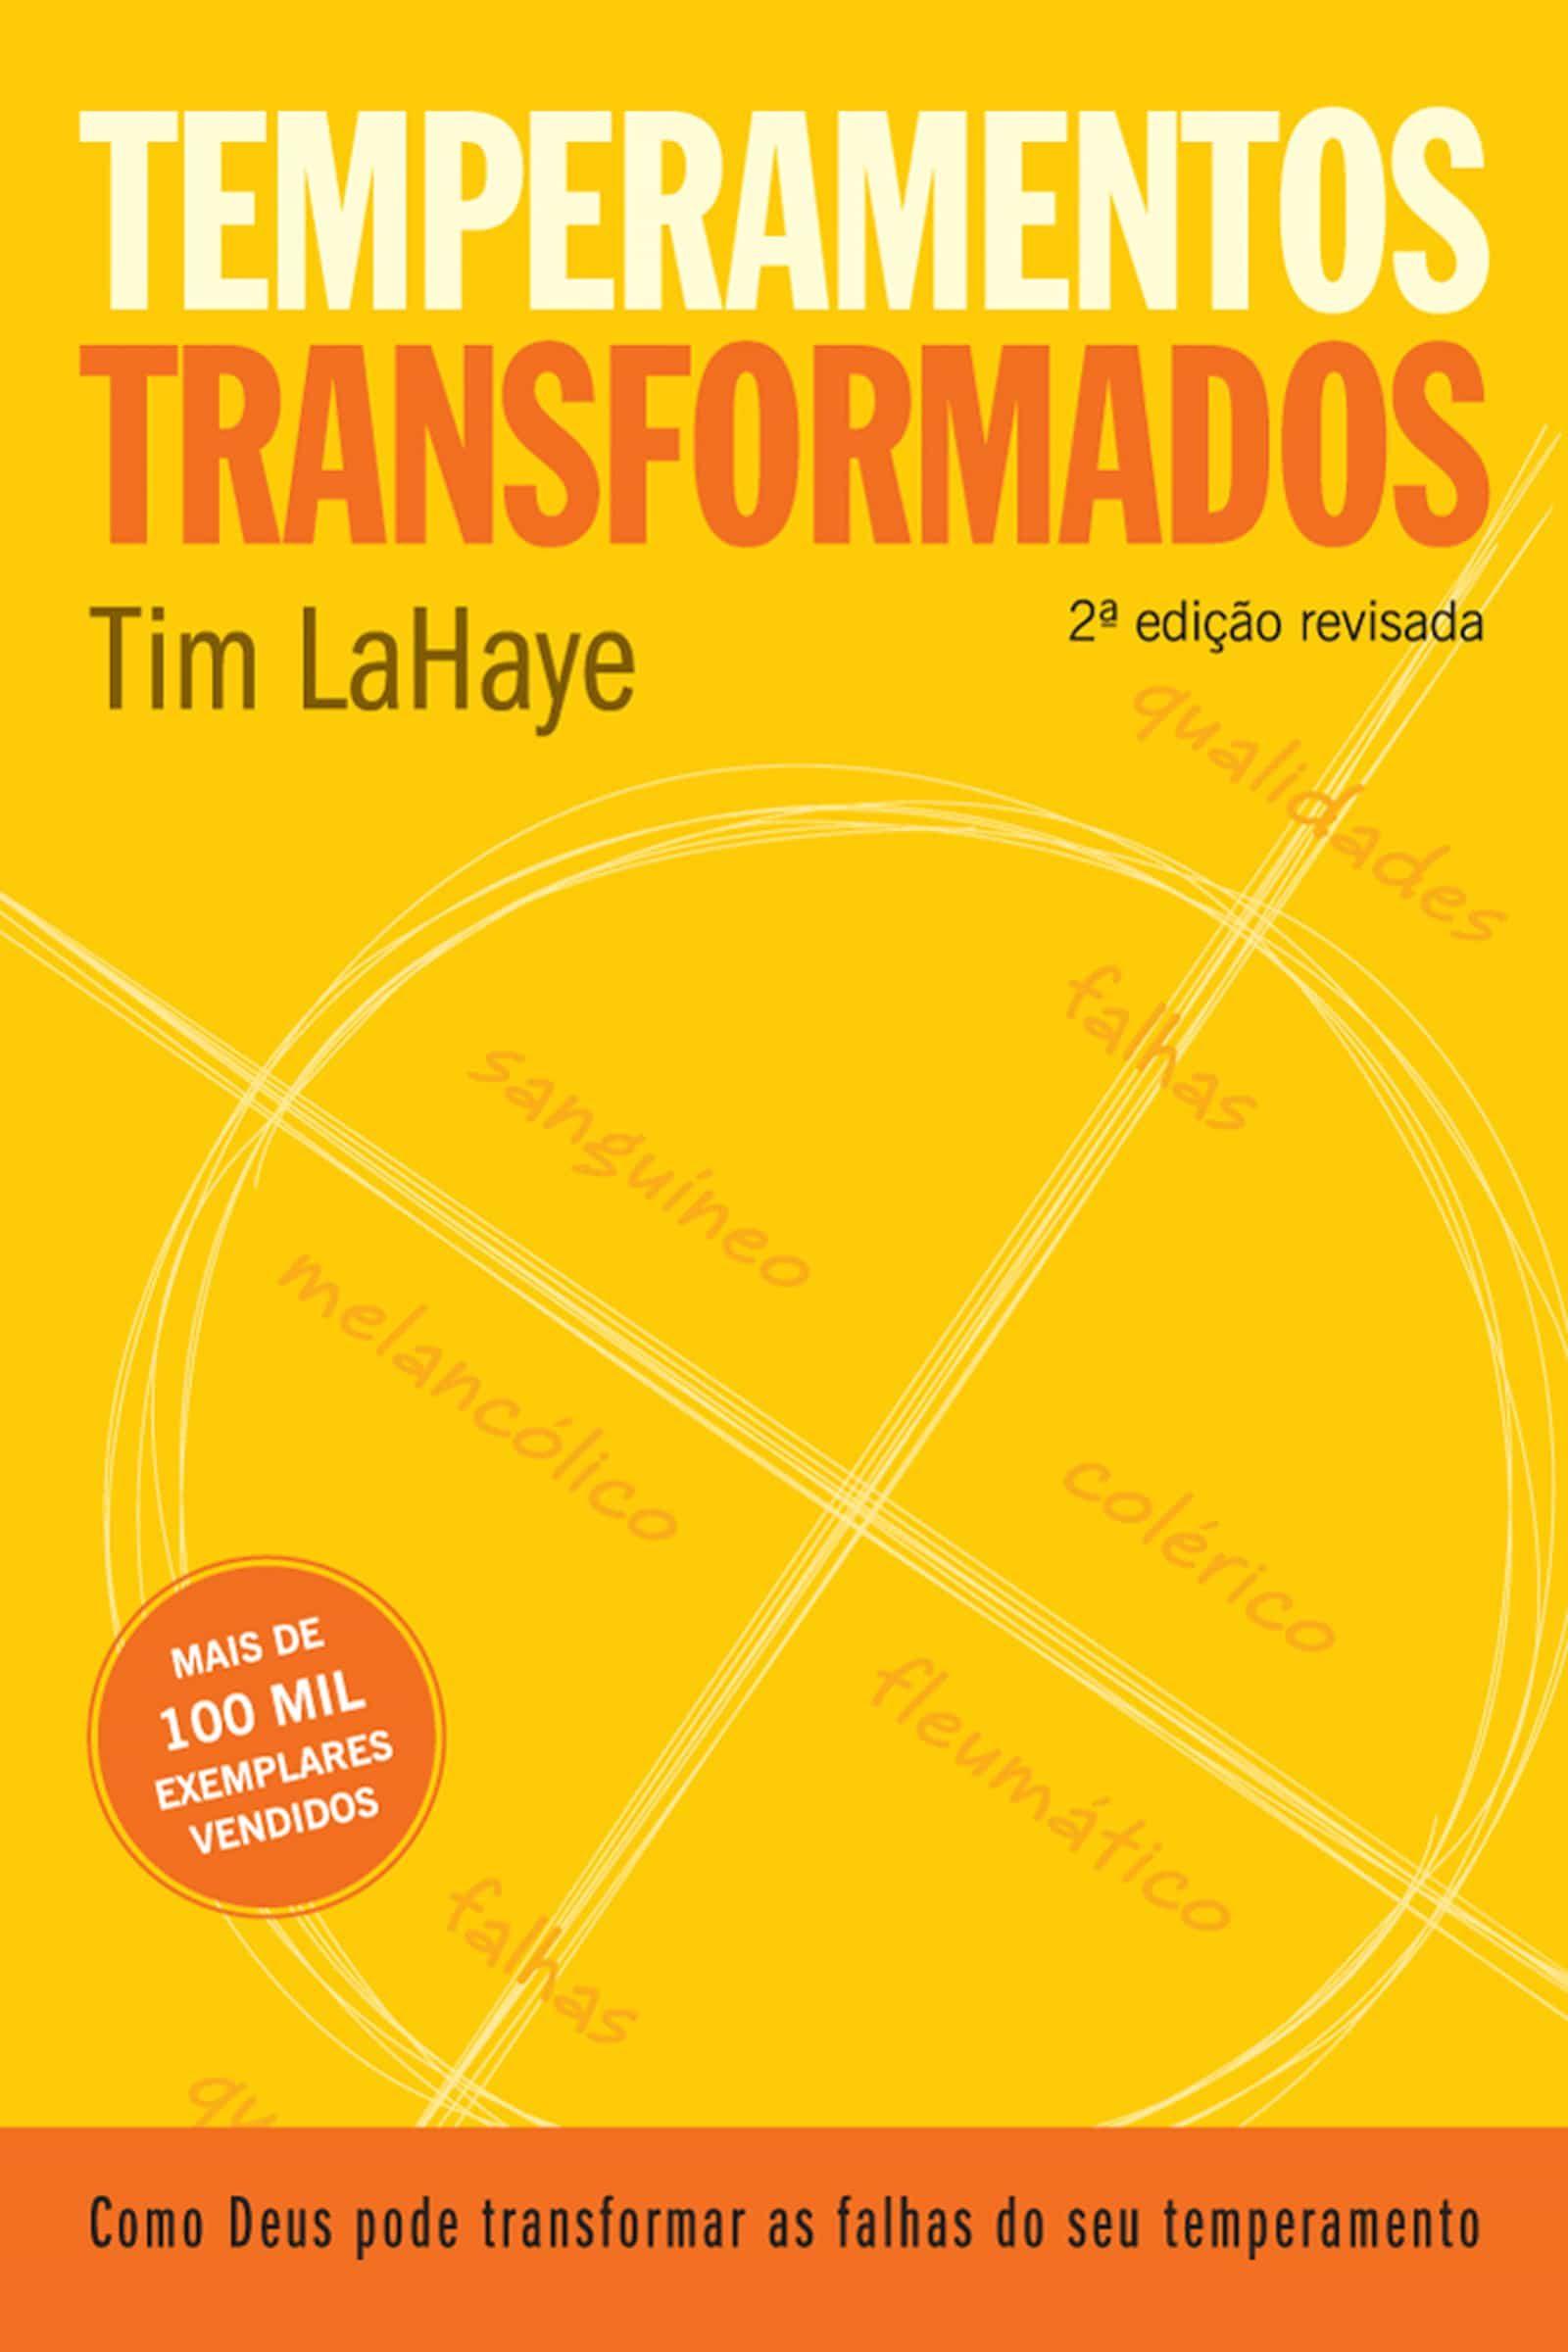 Download livro temperamentos transformados tim lahaye em epub.